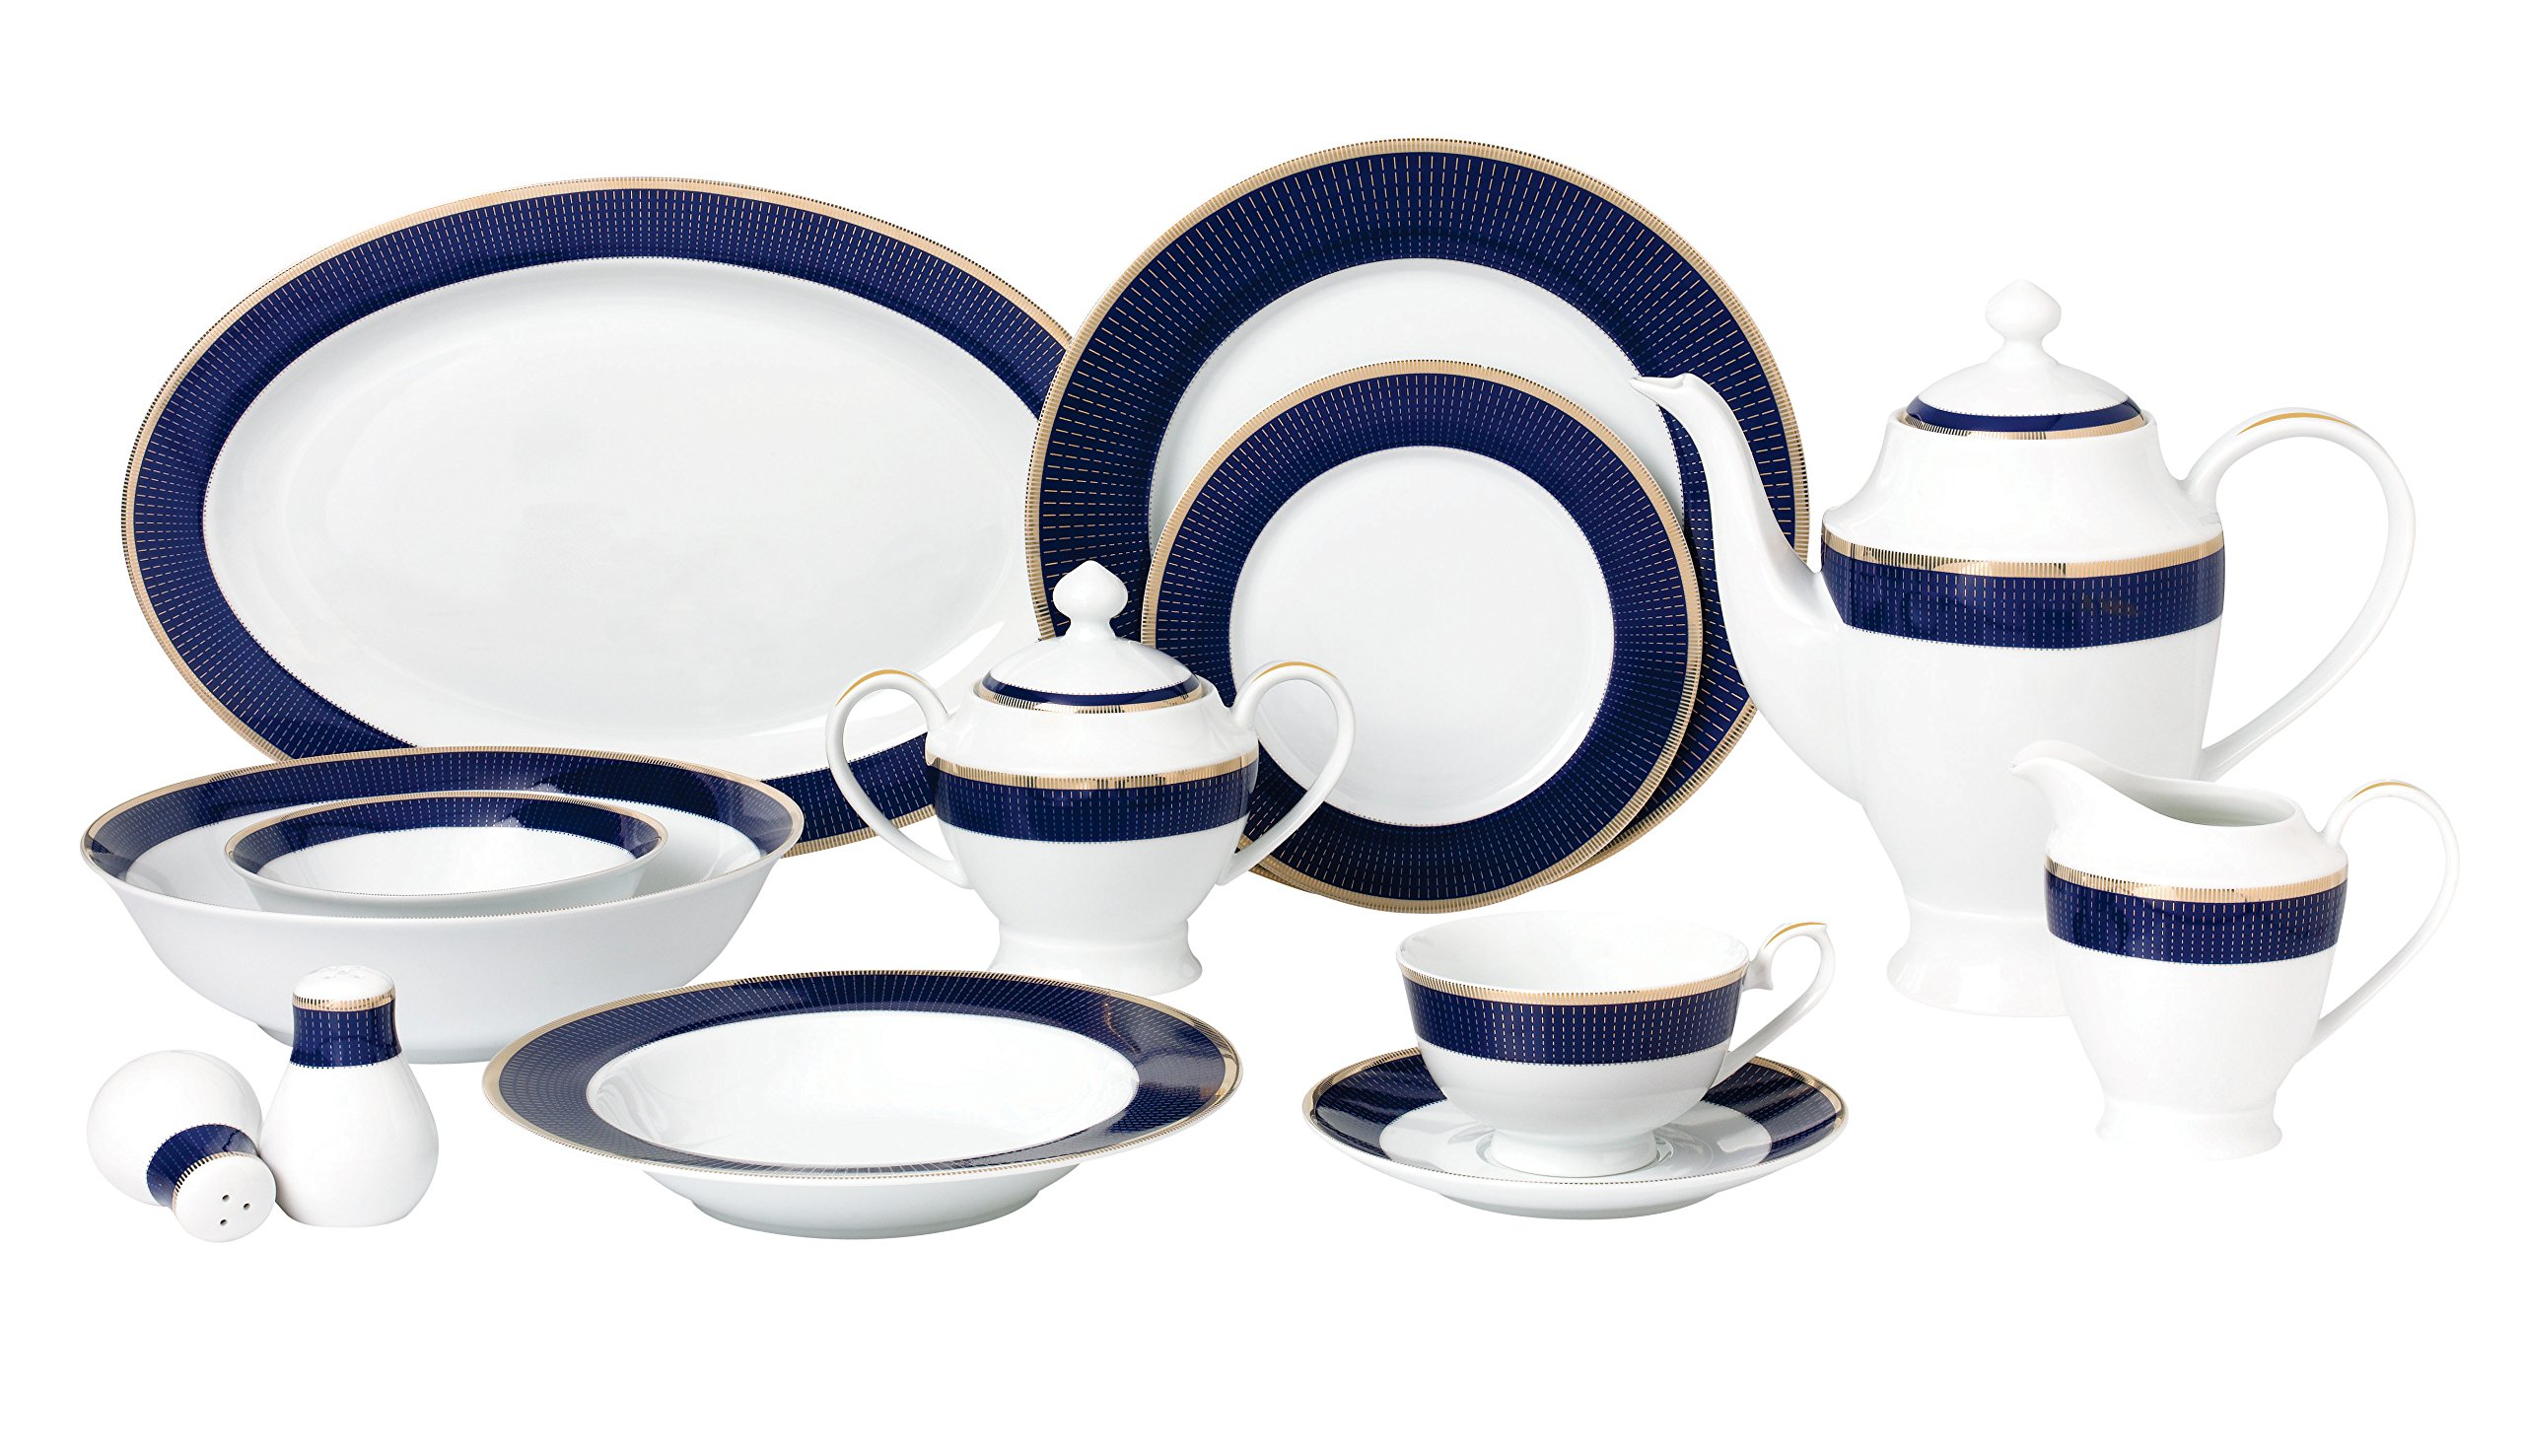 Lorren Home Trends 57 Piece 'Midnight' Bone China Dinnerware Set (Service for 8 People), Blue